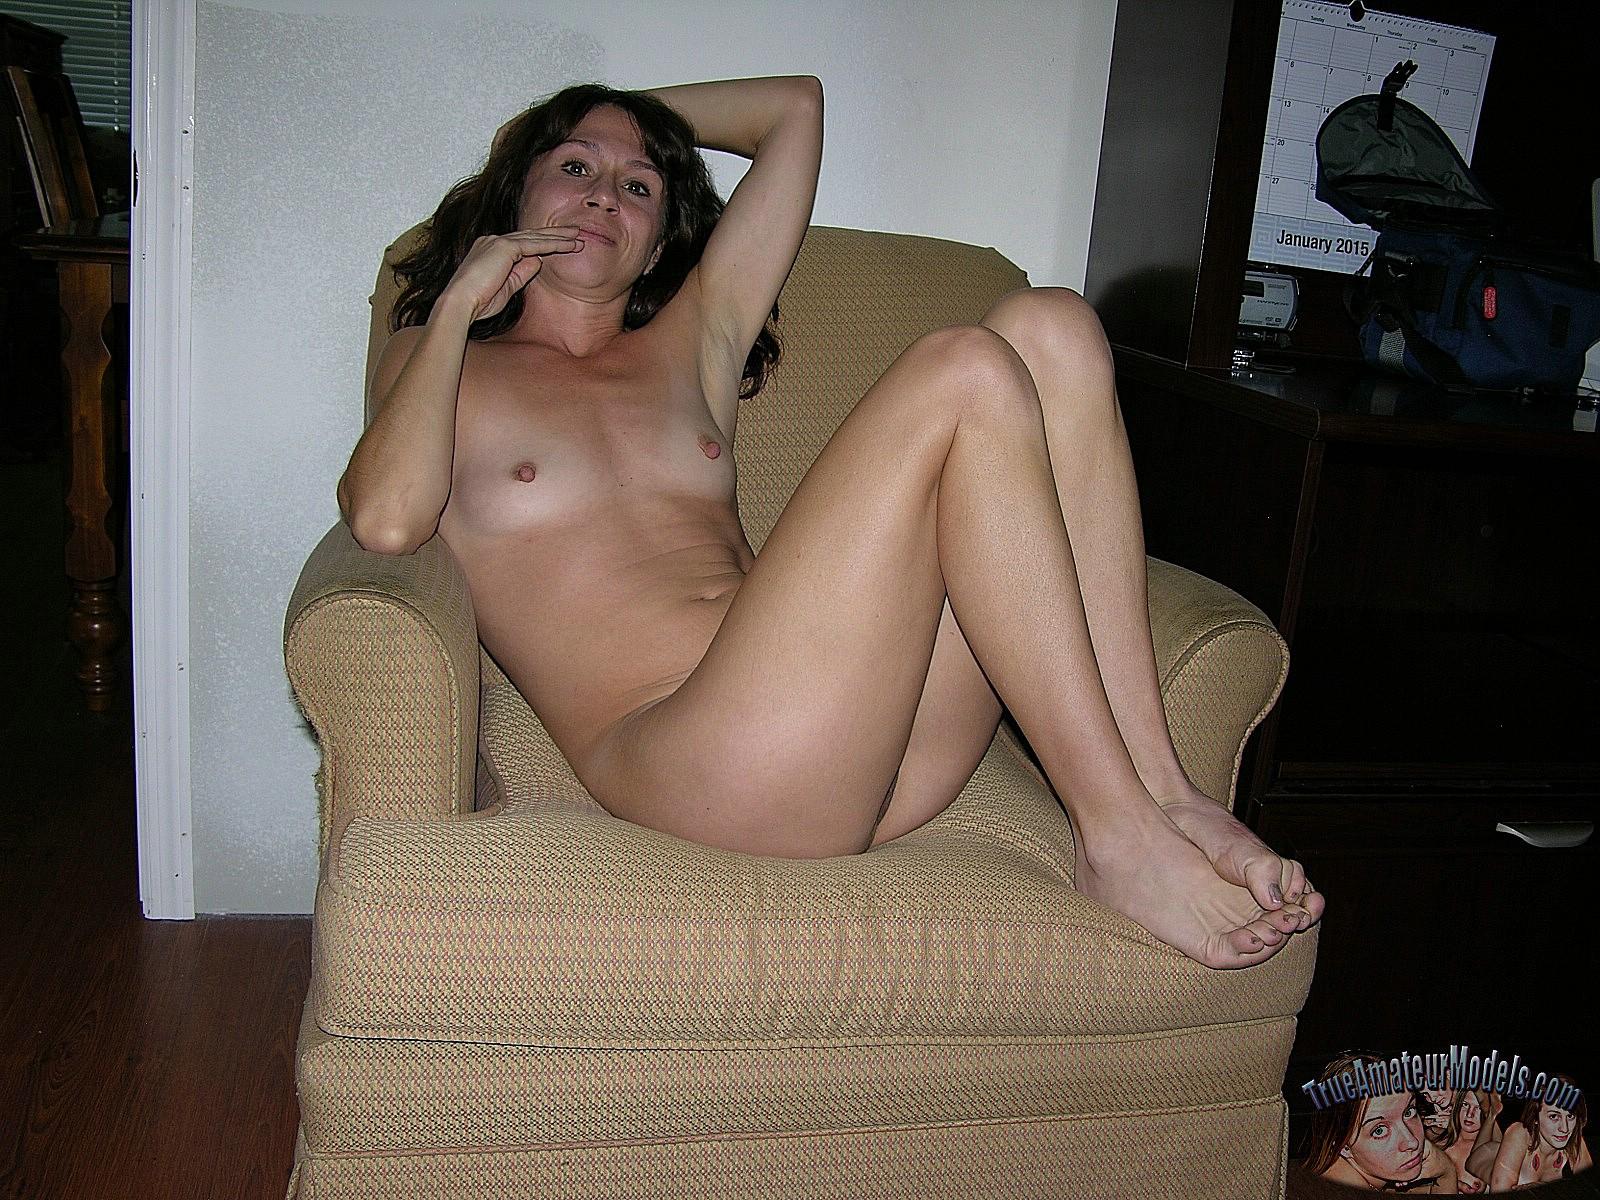 Amdabad gils nude photos com